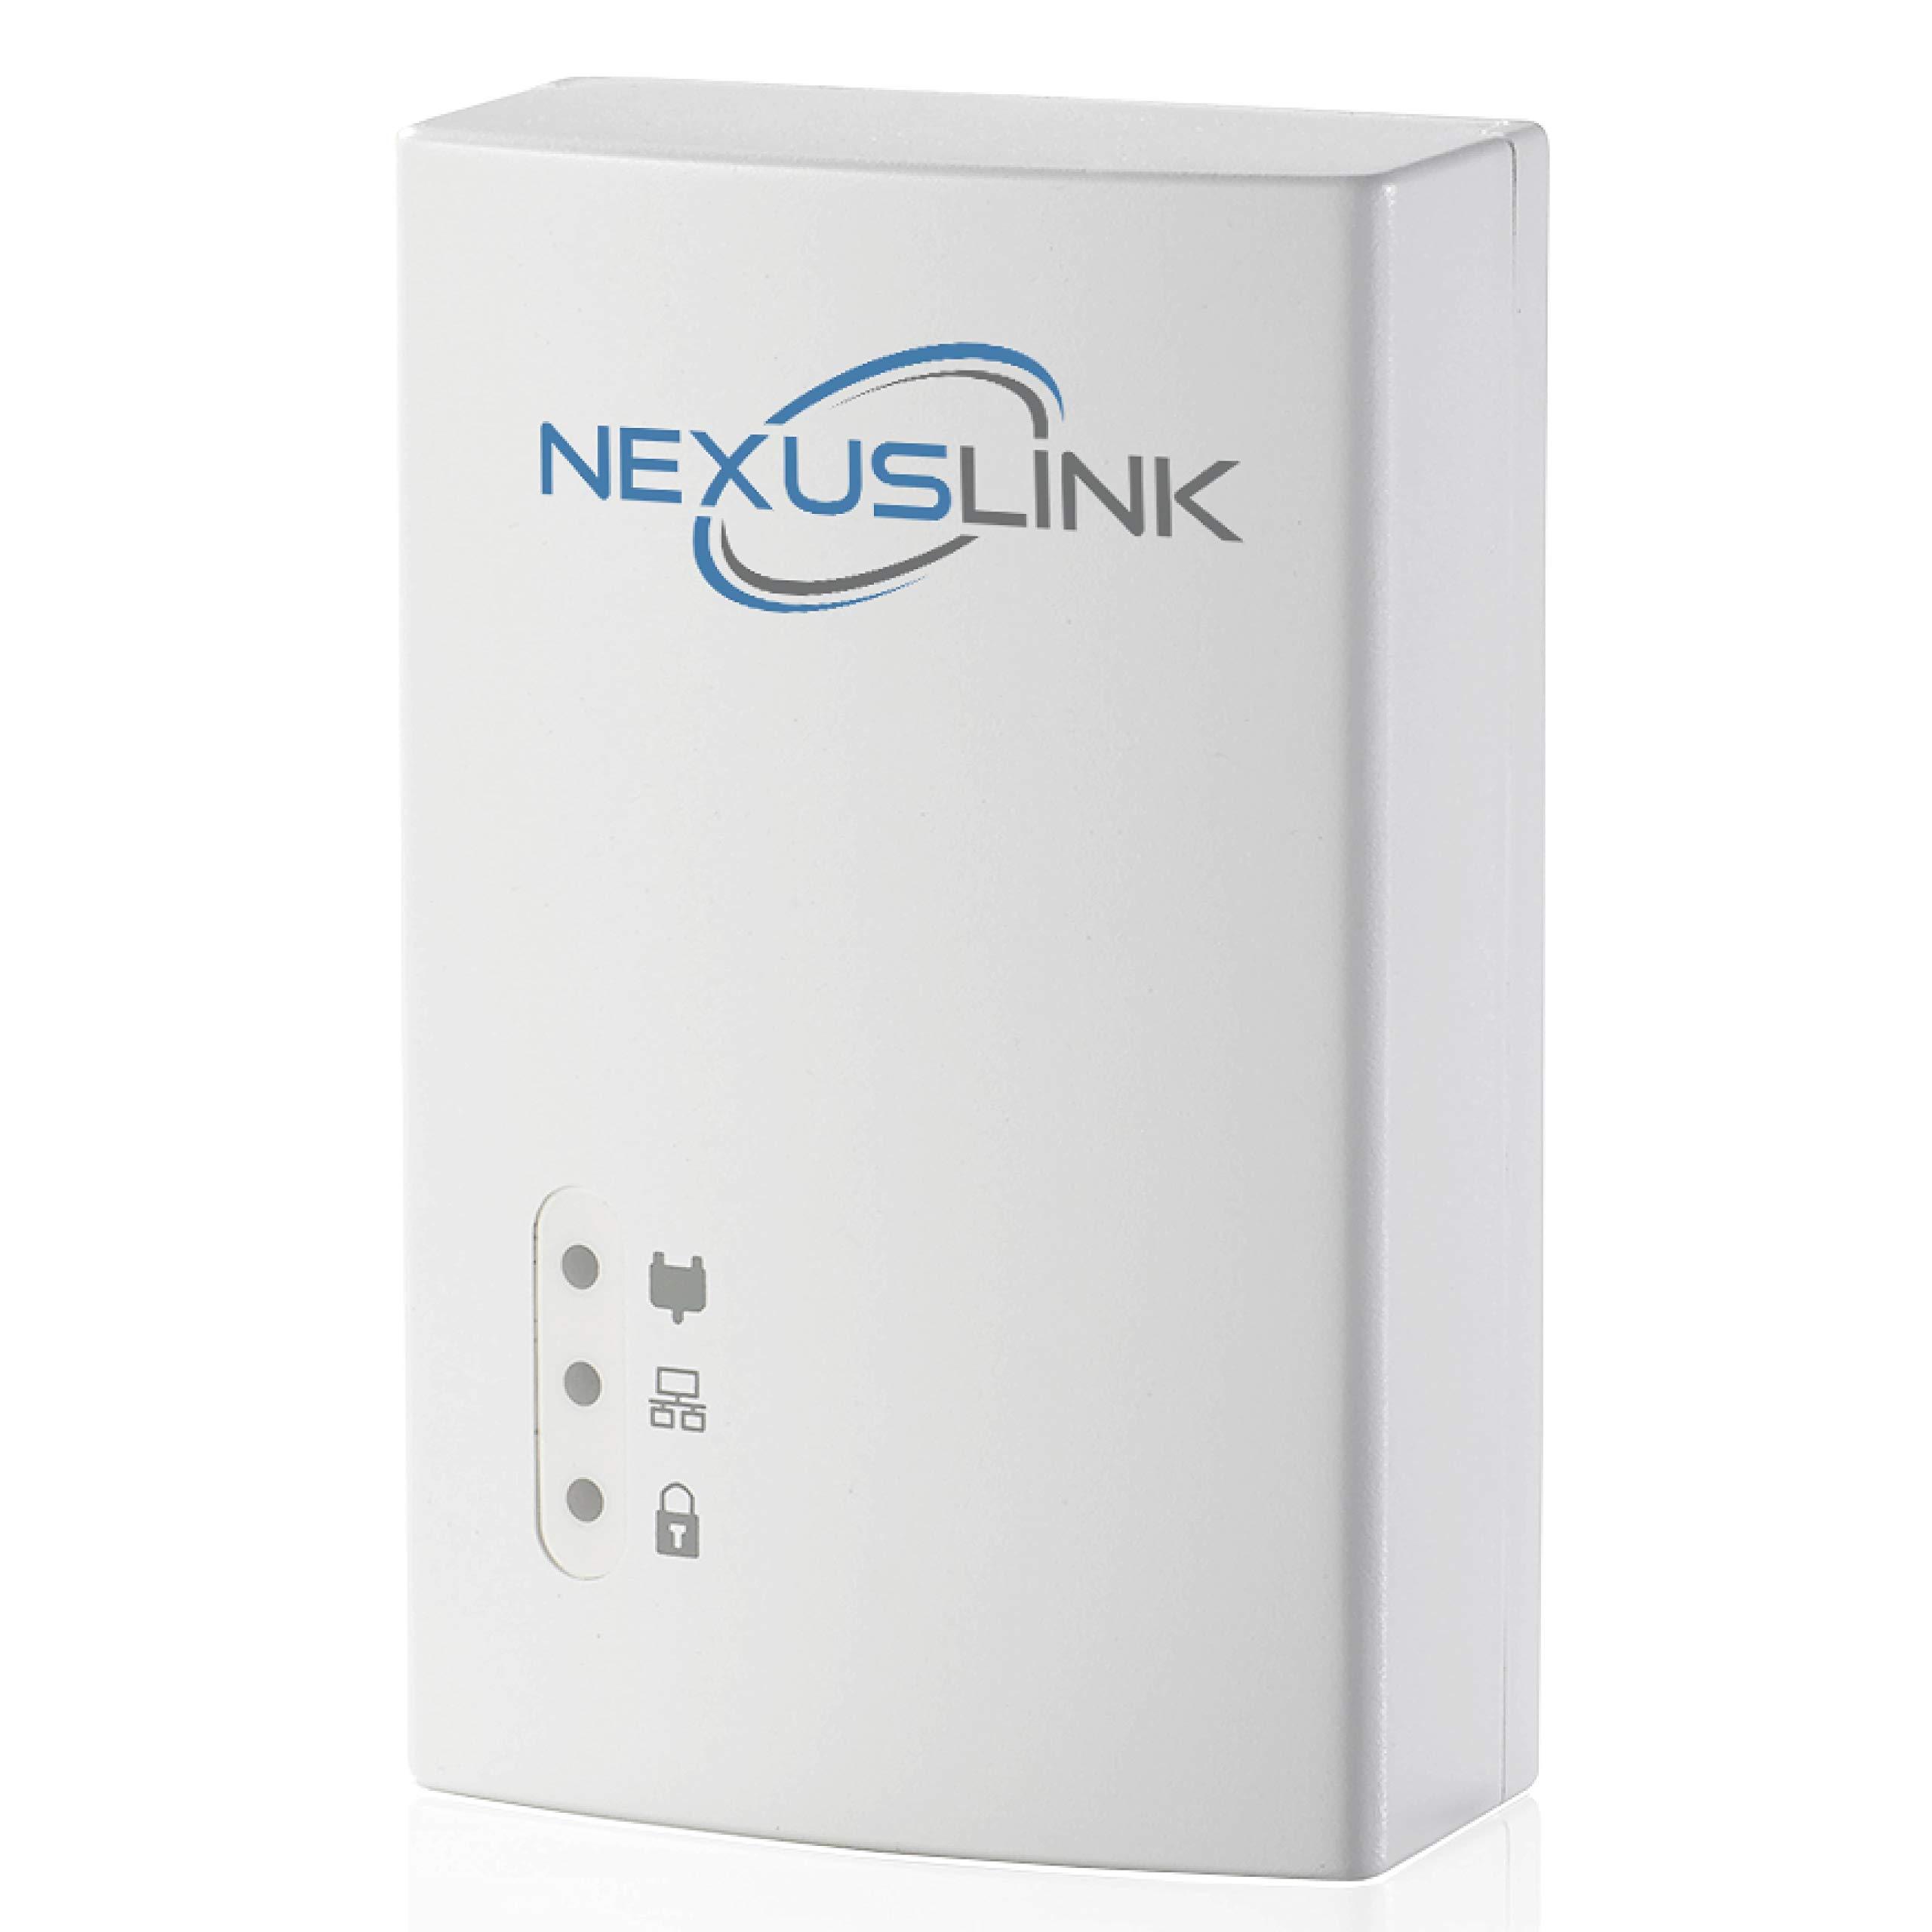 NexusLink Powerline G.hn Powerline Adapter   1200Mbps (GPL-1200) by NEXUSLINK